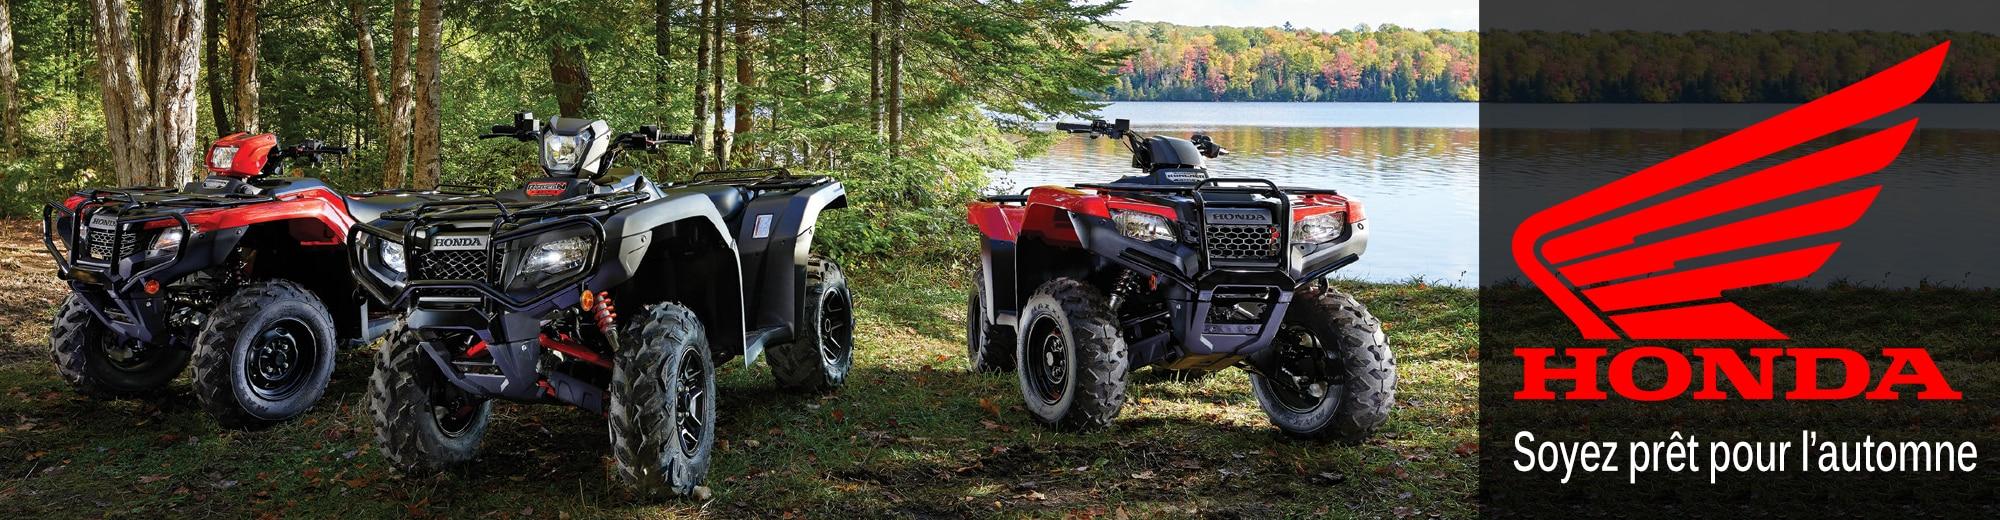 Moto Repentigny Honda Et Suzuki Moto Vtt A Vendre A